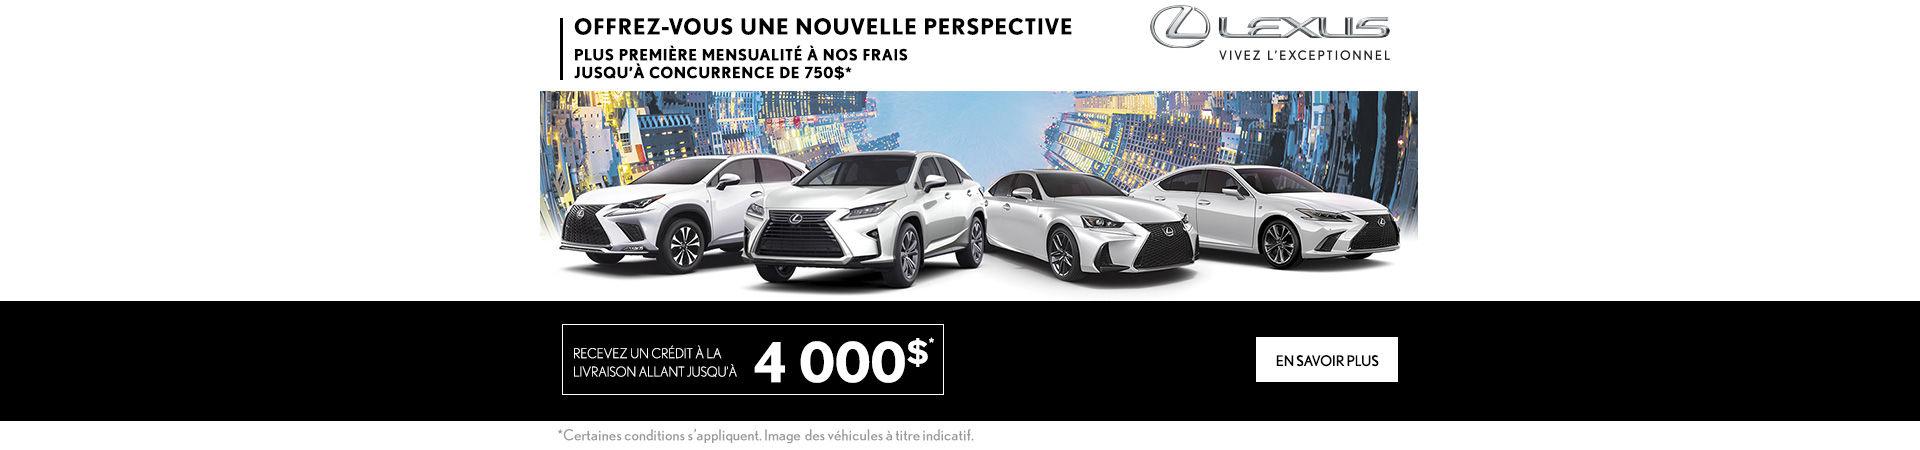 Événement Lexus